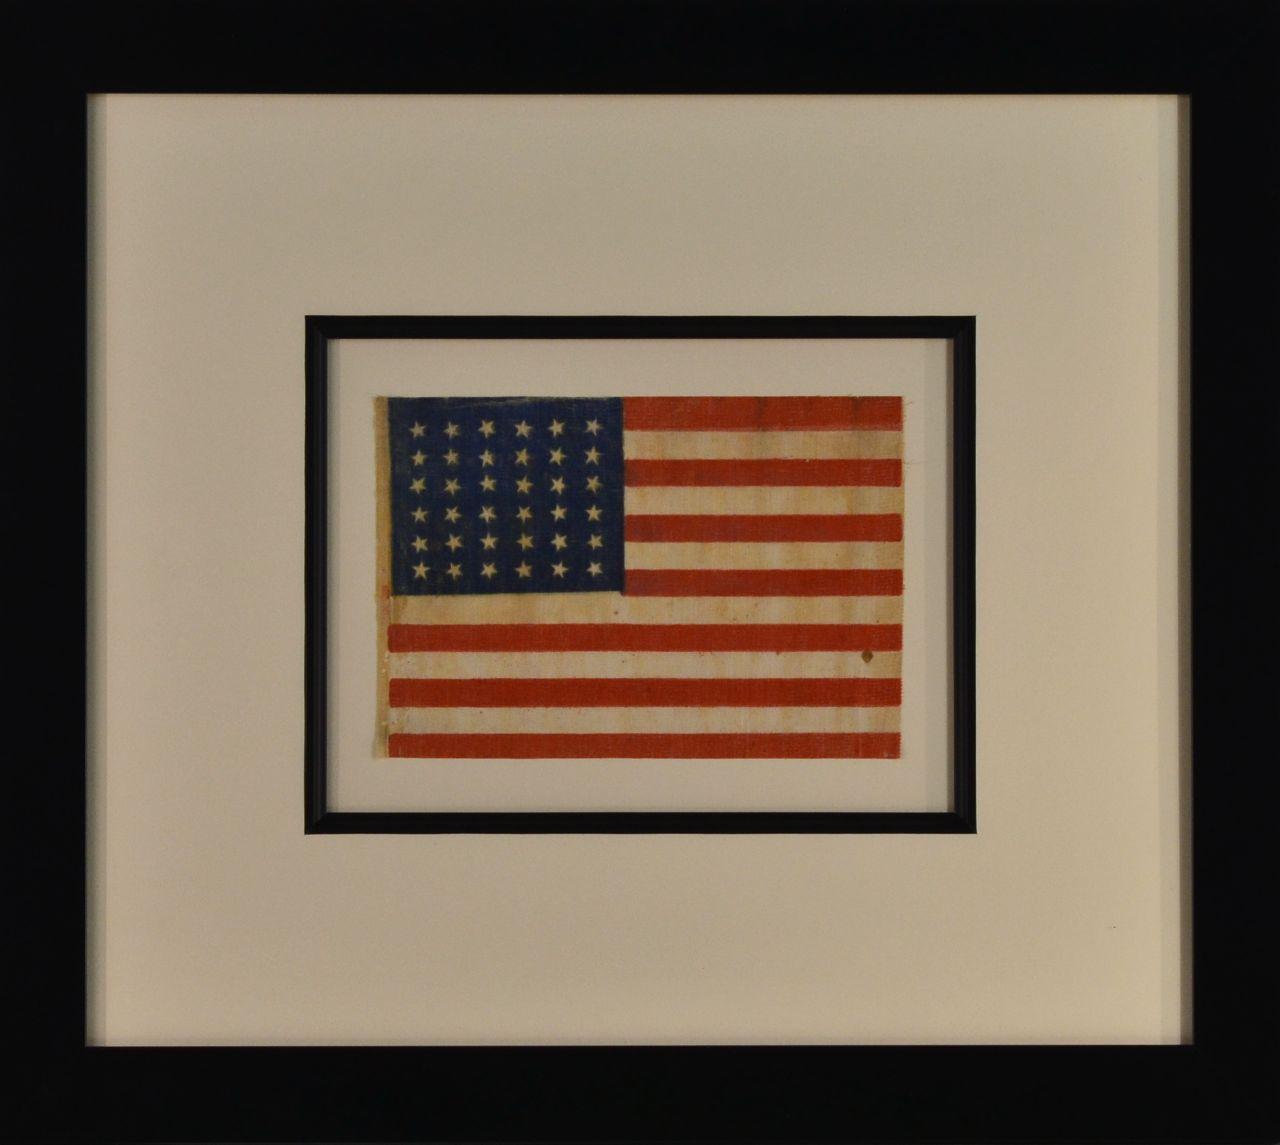 36 STAR FLAG IMAGE